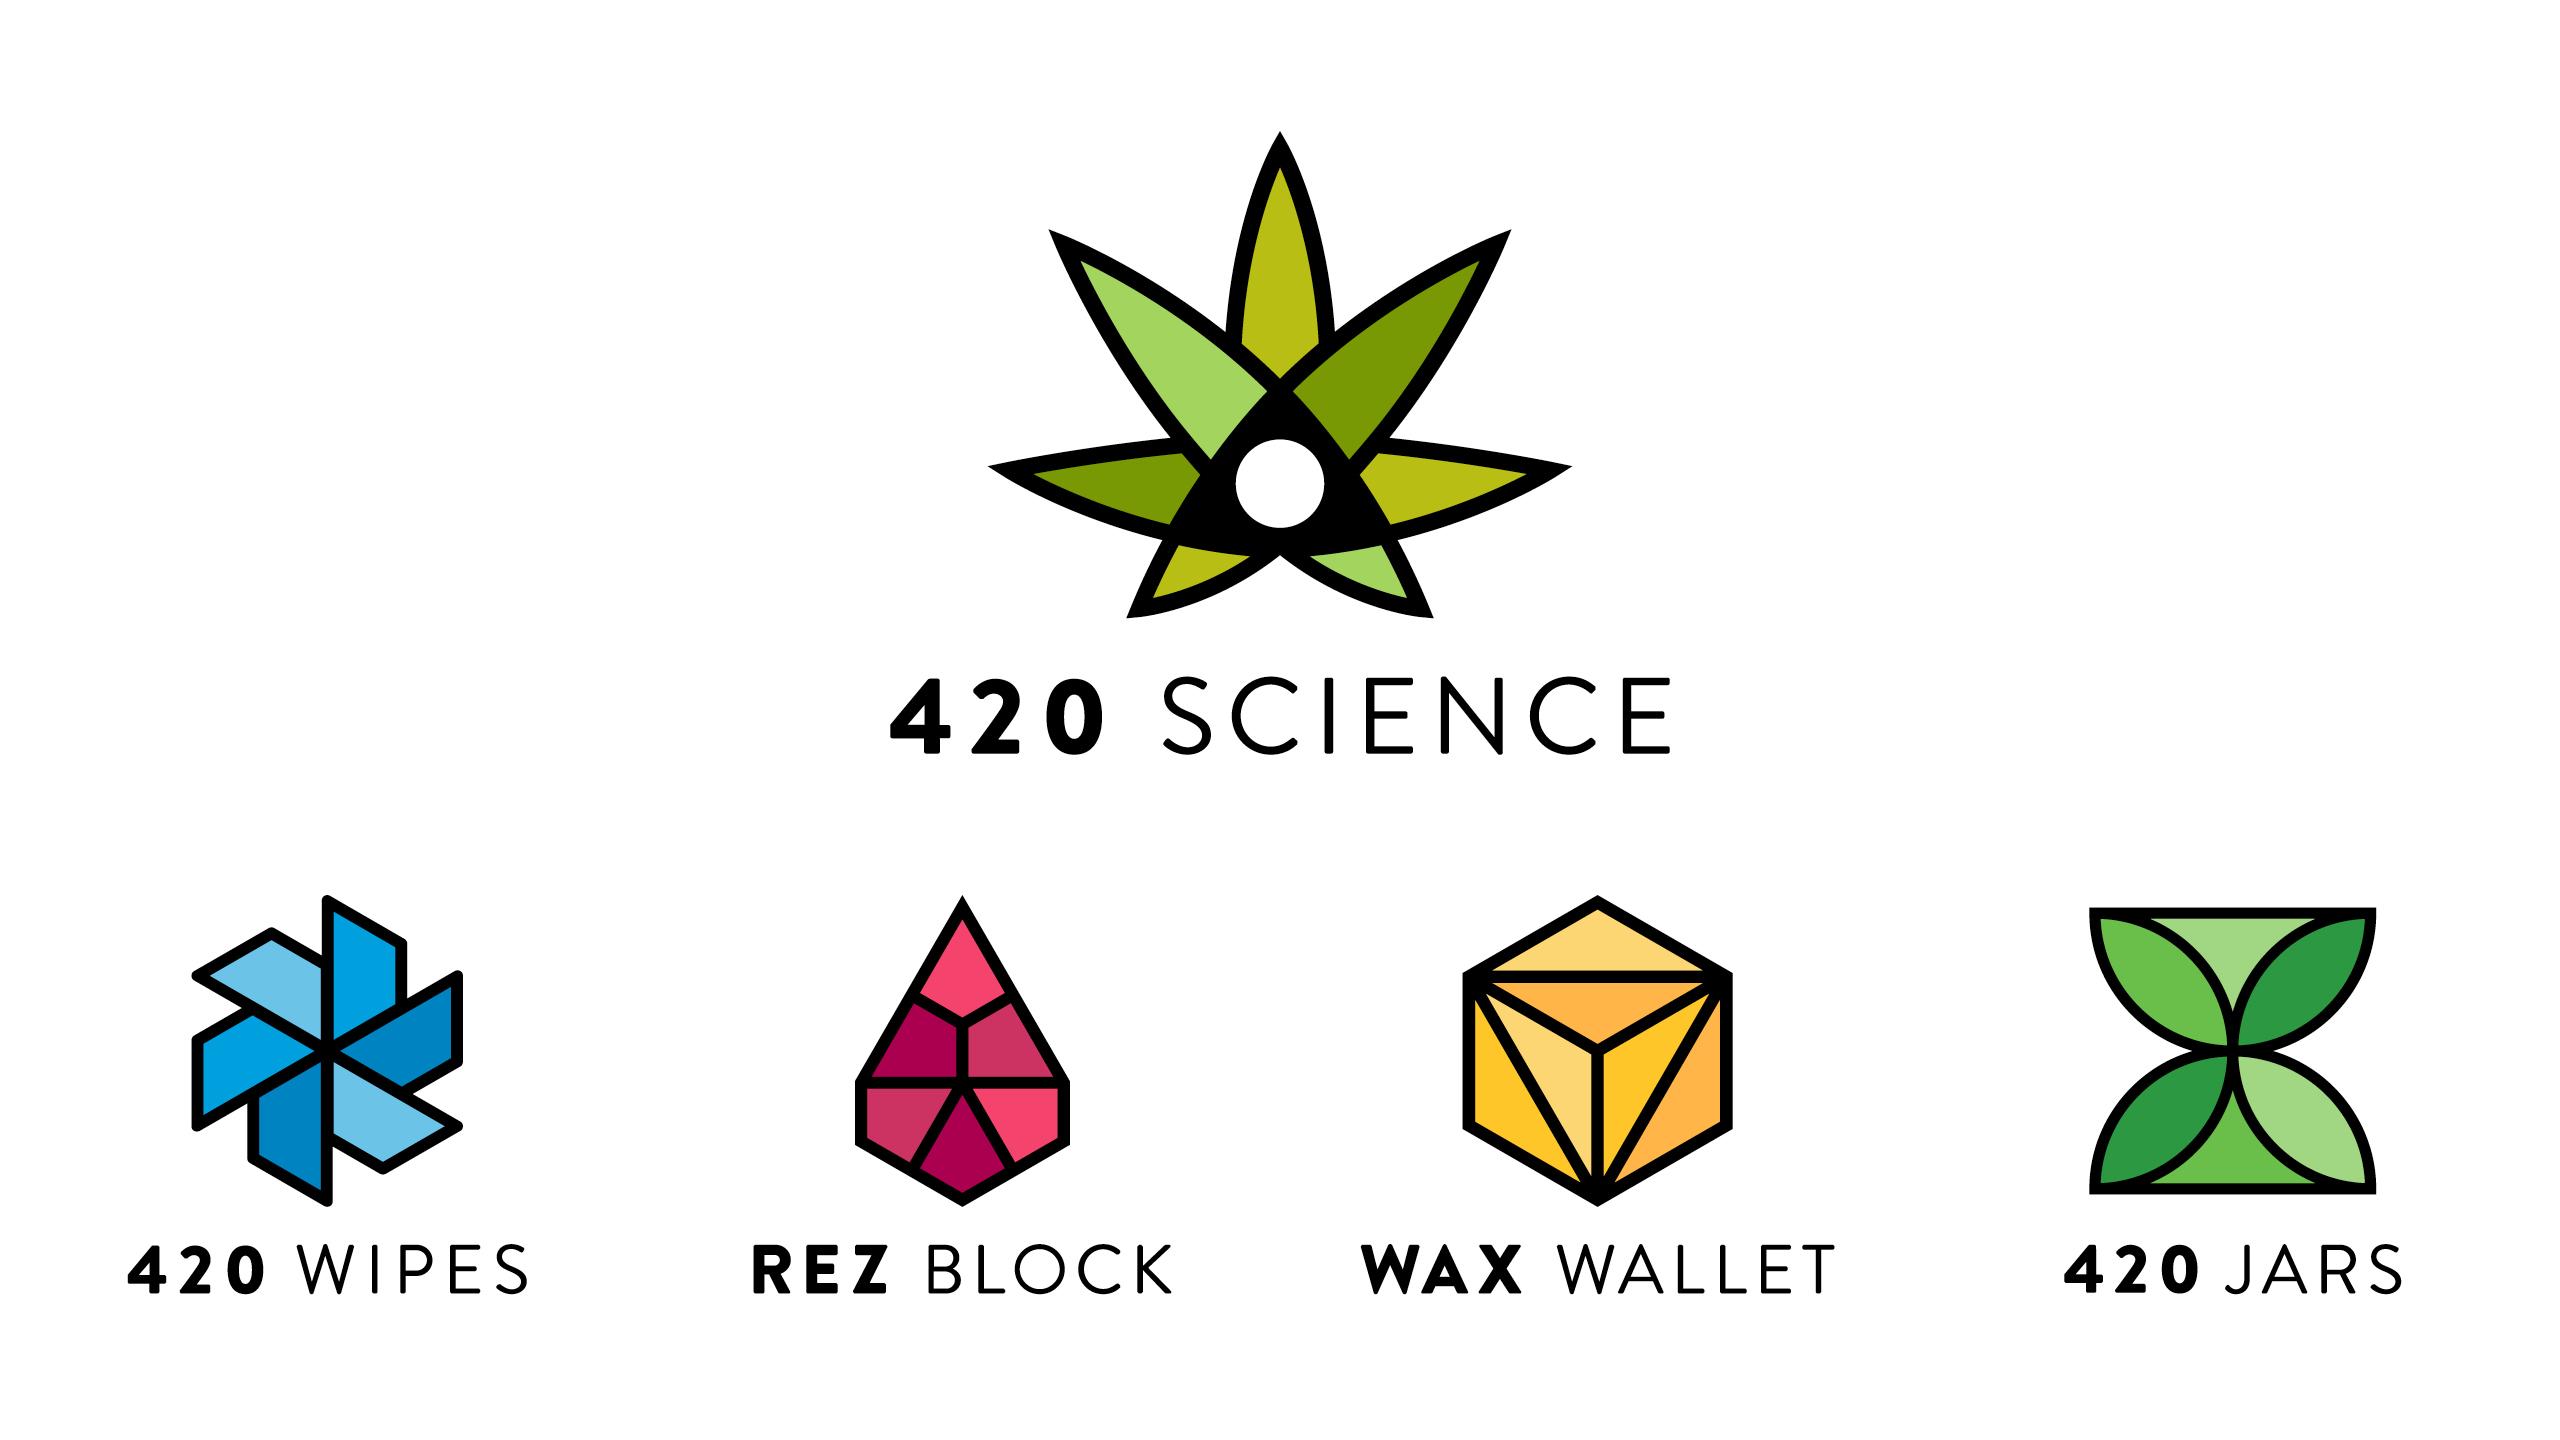 420 Science Brand Identity Refresh by High Road Design Studio